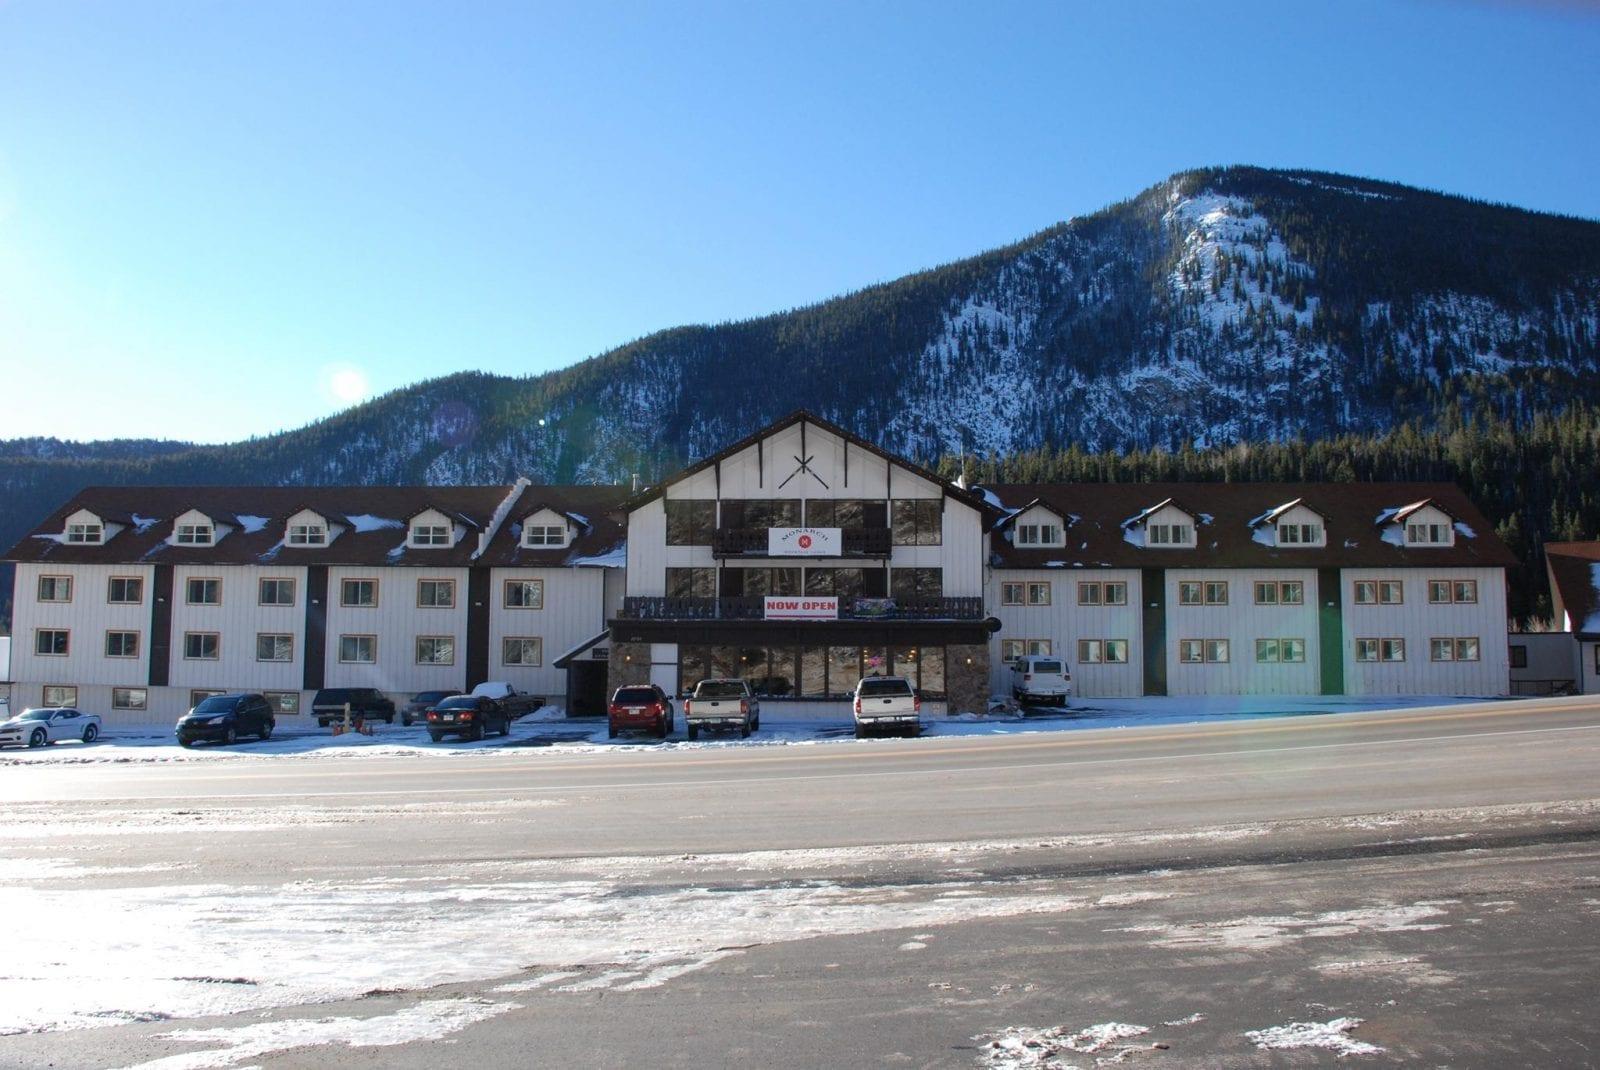 Monarch Mountain Lodge in Salida, CO